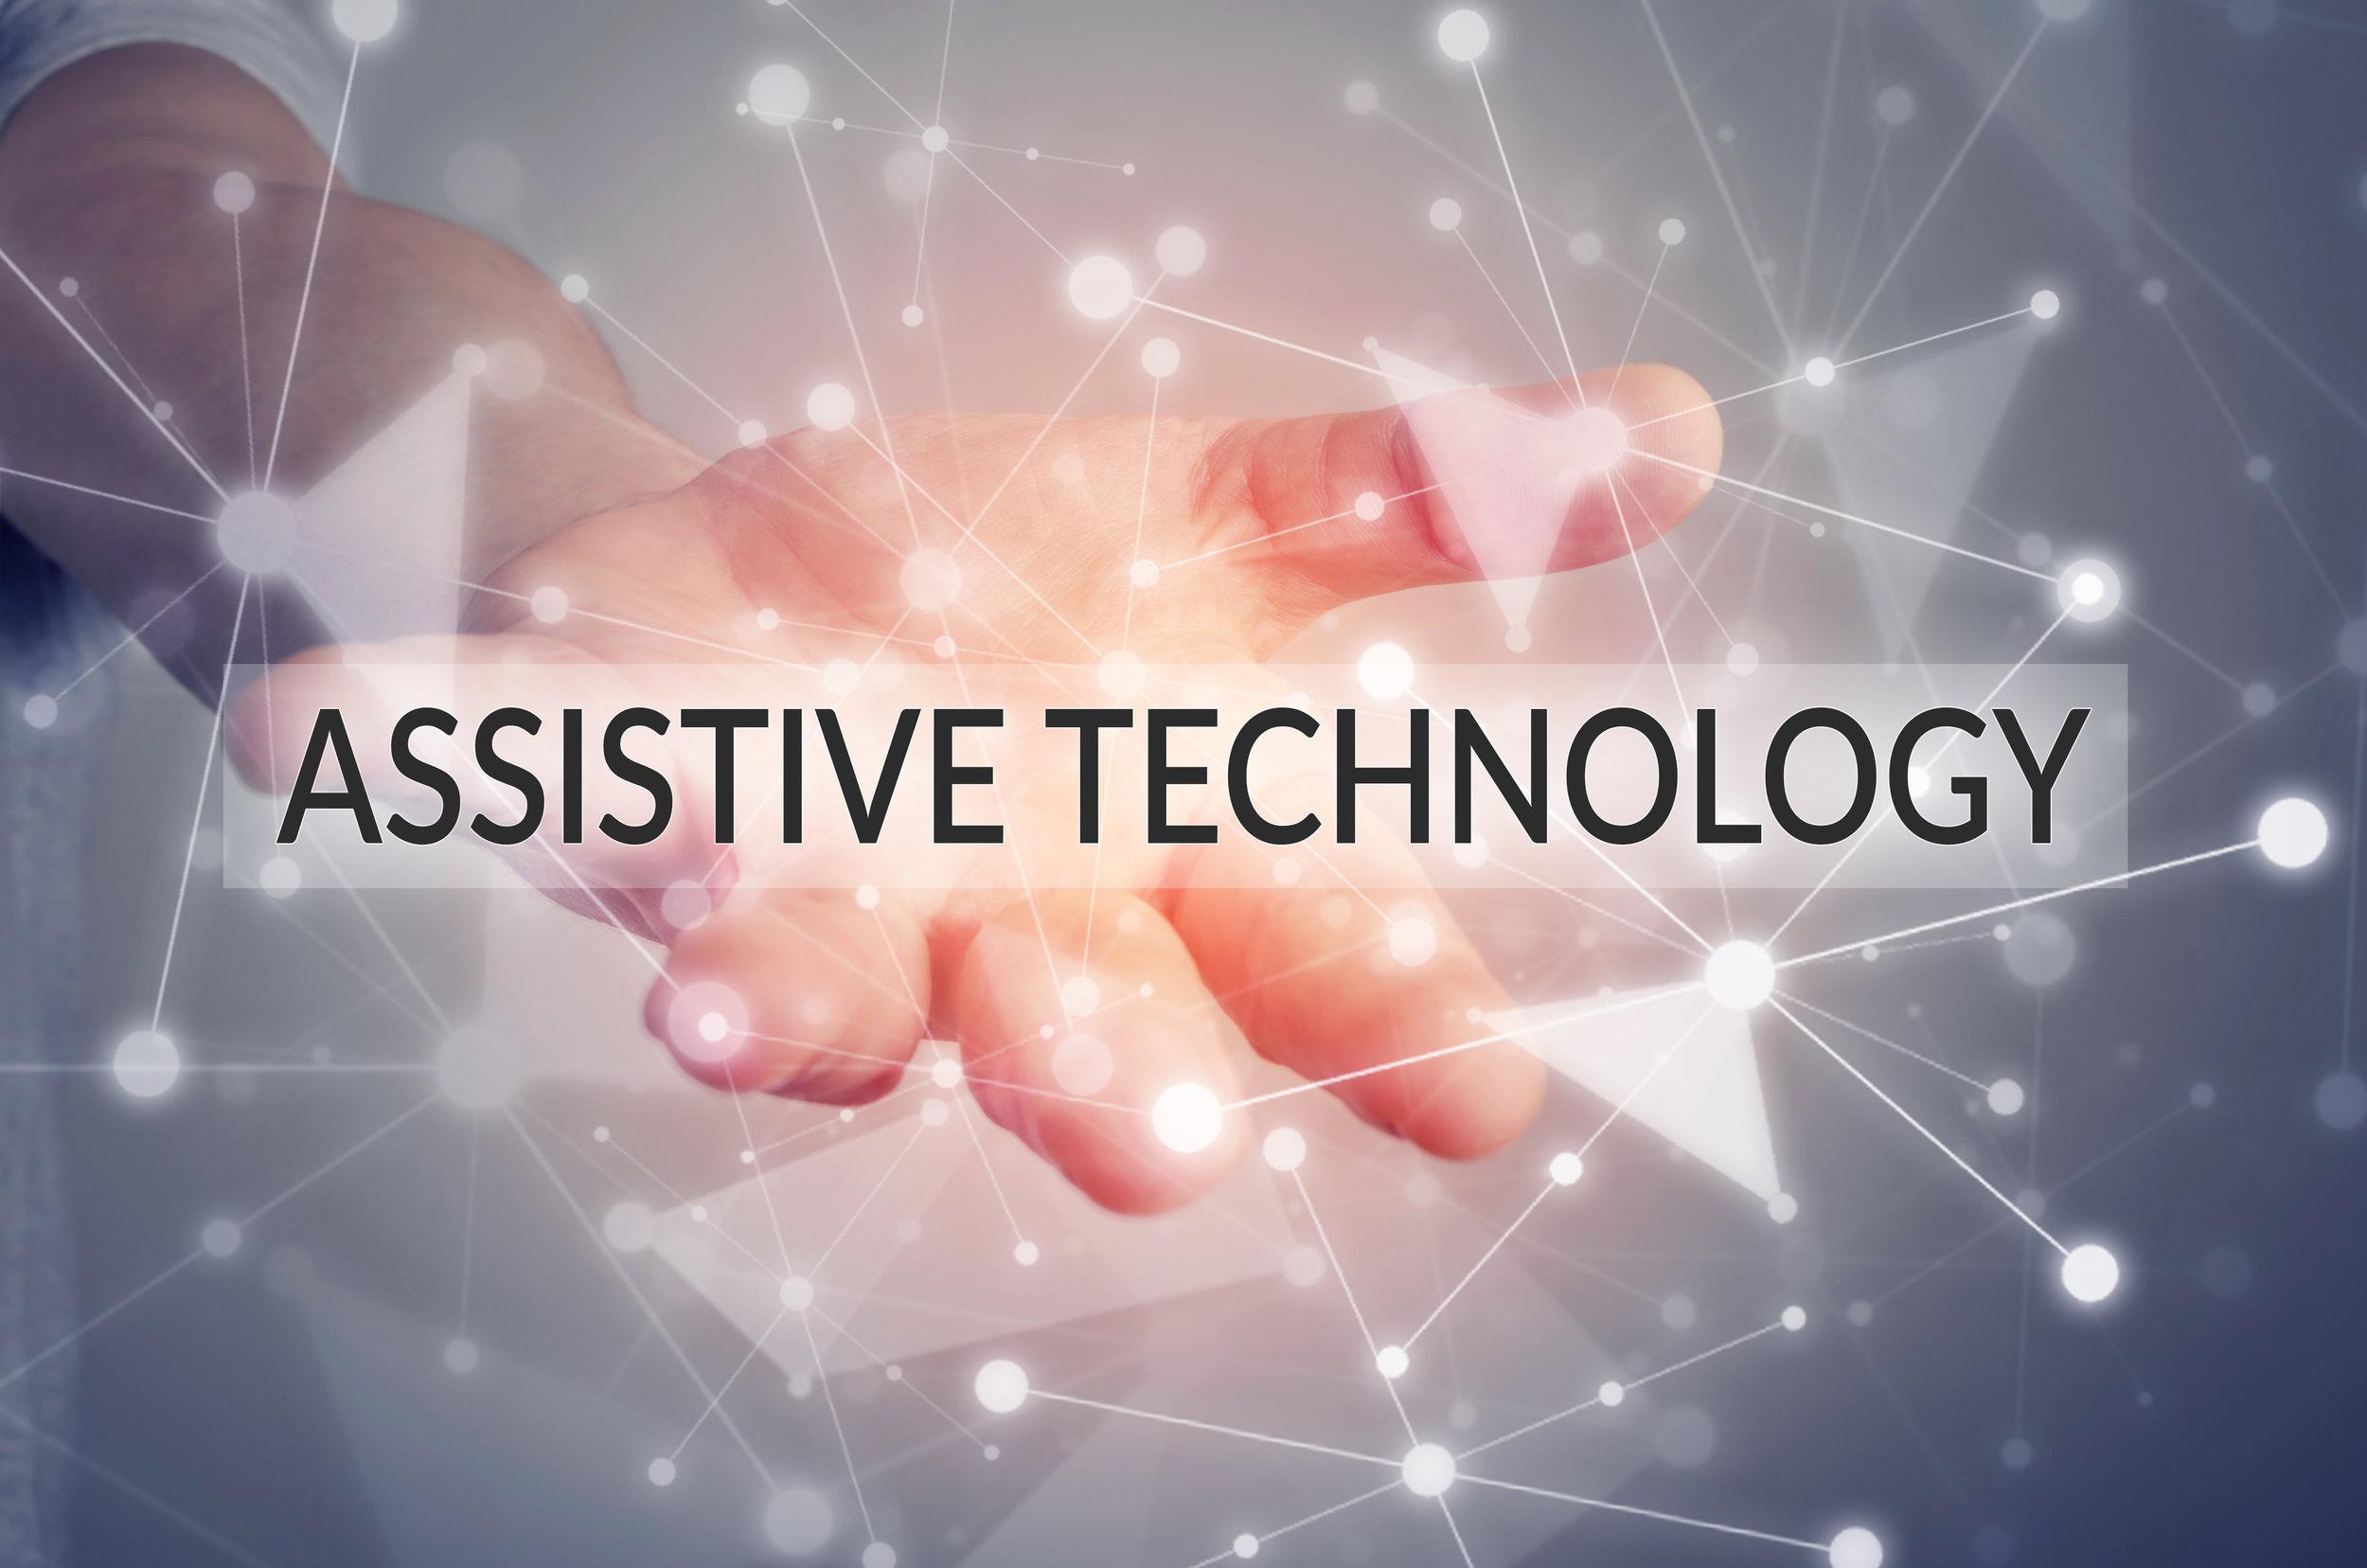 AssistiveTechnology_1.jpg